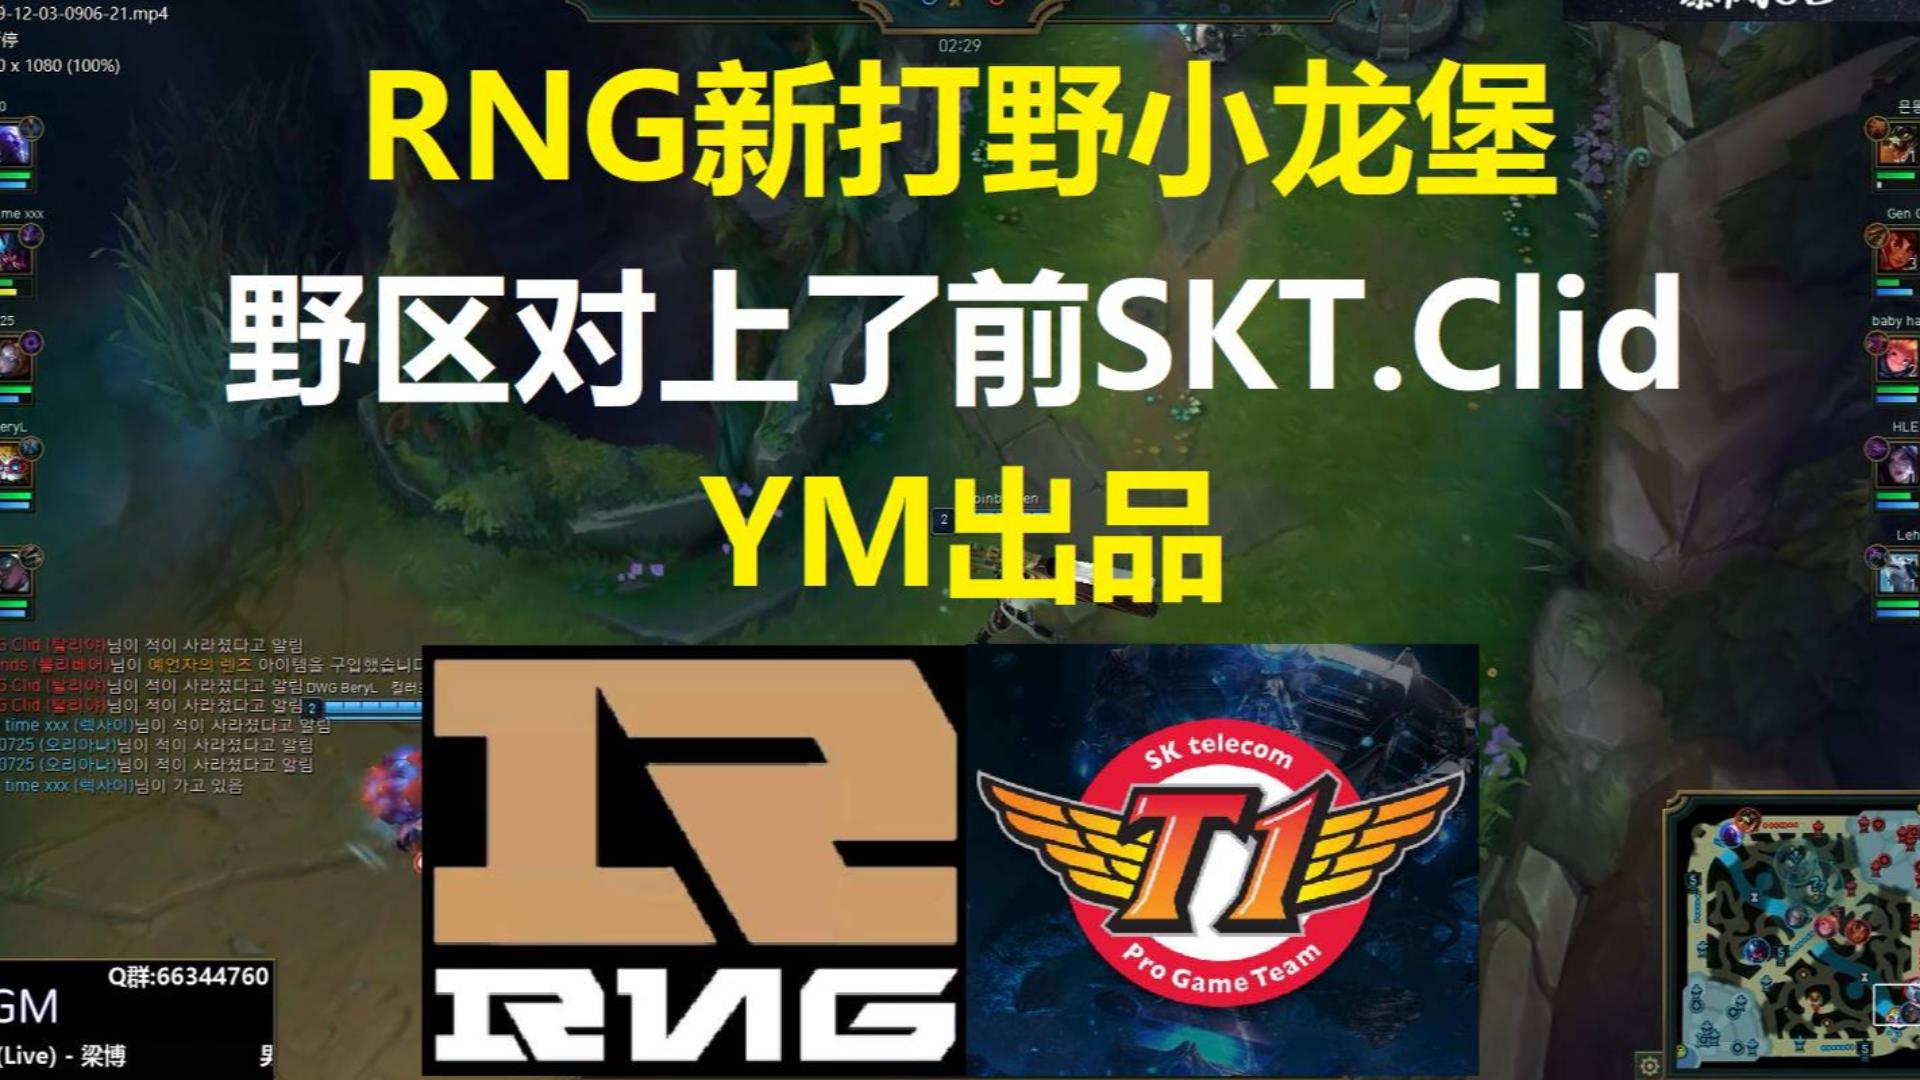 RNG新打野小龙堡野区对上了Clid,YM出品,全明星局!